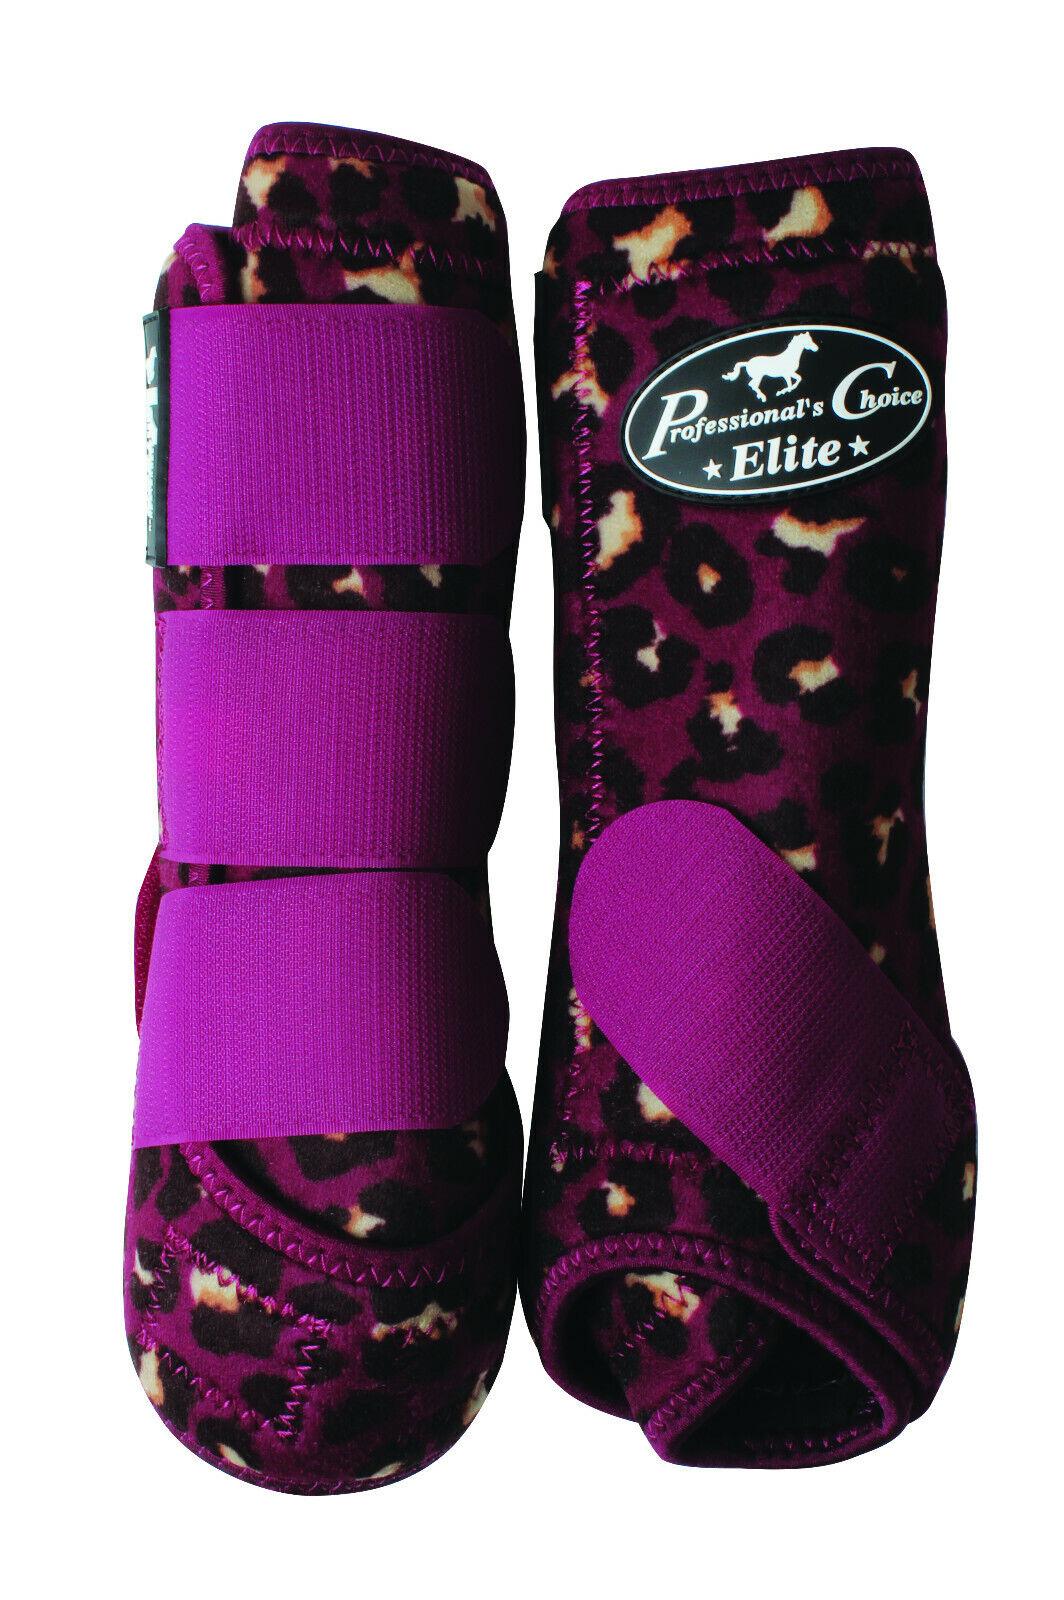 Professionals Choice Sport Medicine Boot Ventech Elite Front Leg Pair  Cheetah  fashion mall